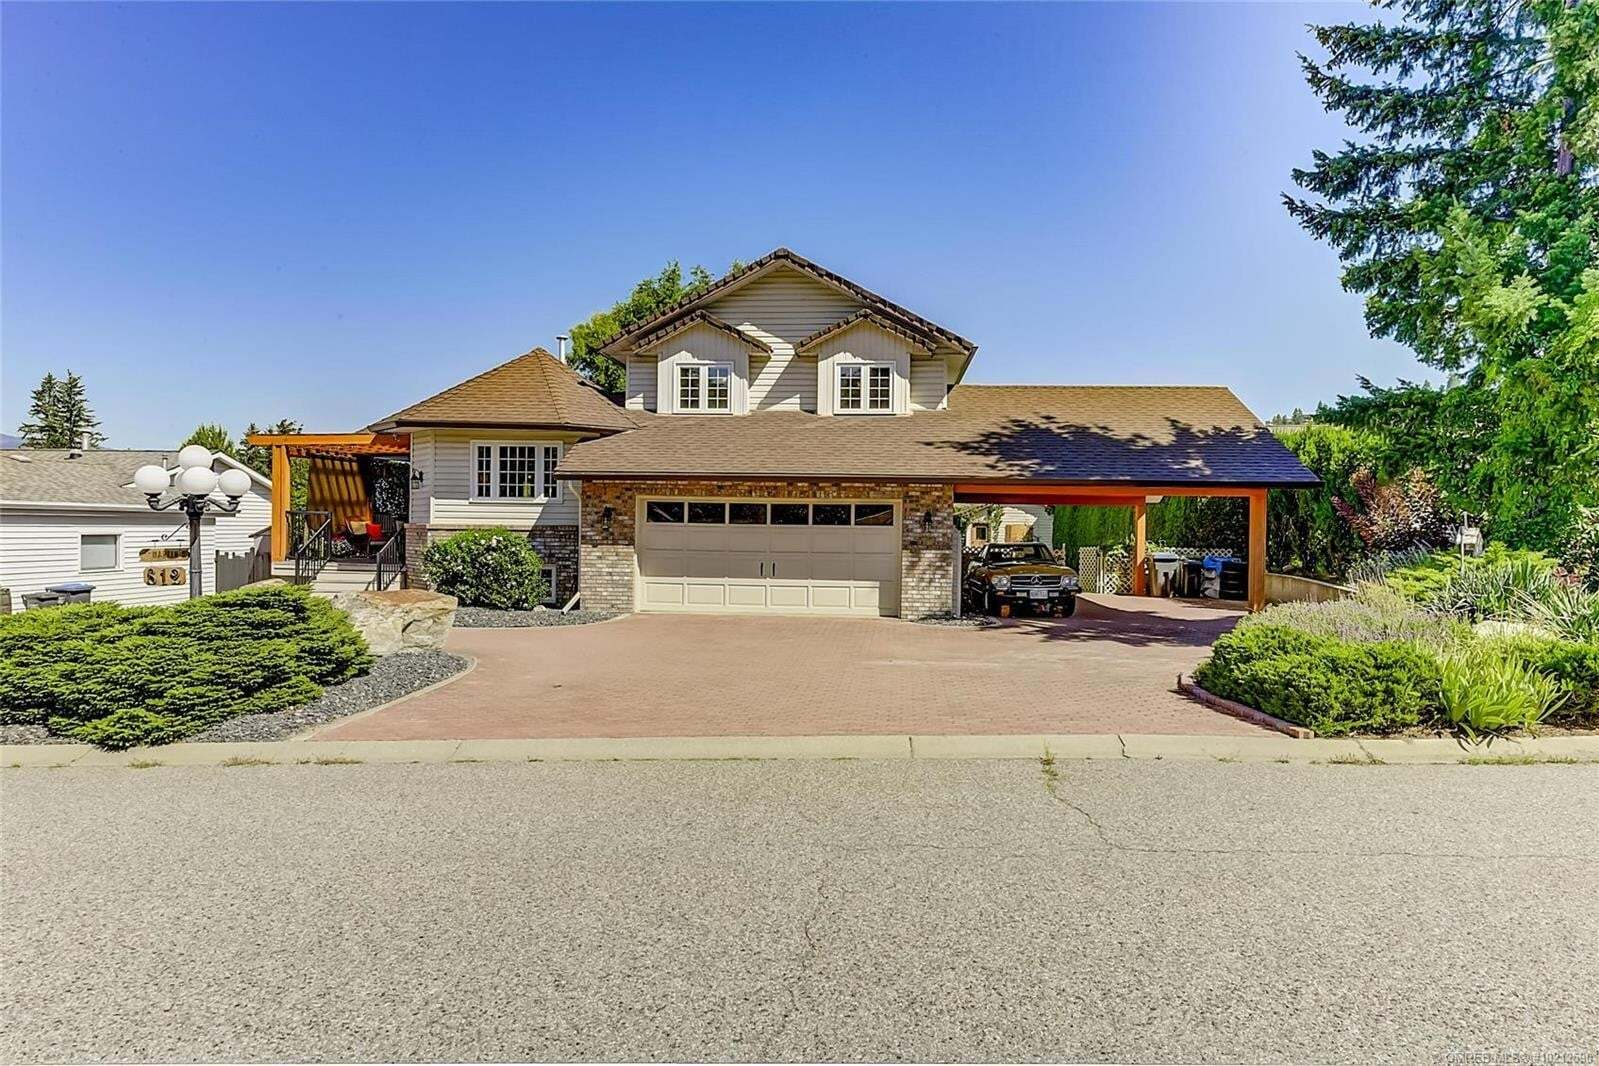 House for sale at 812 Riley Ct Kelowna British Columbia - MLS: 10212590